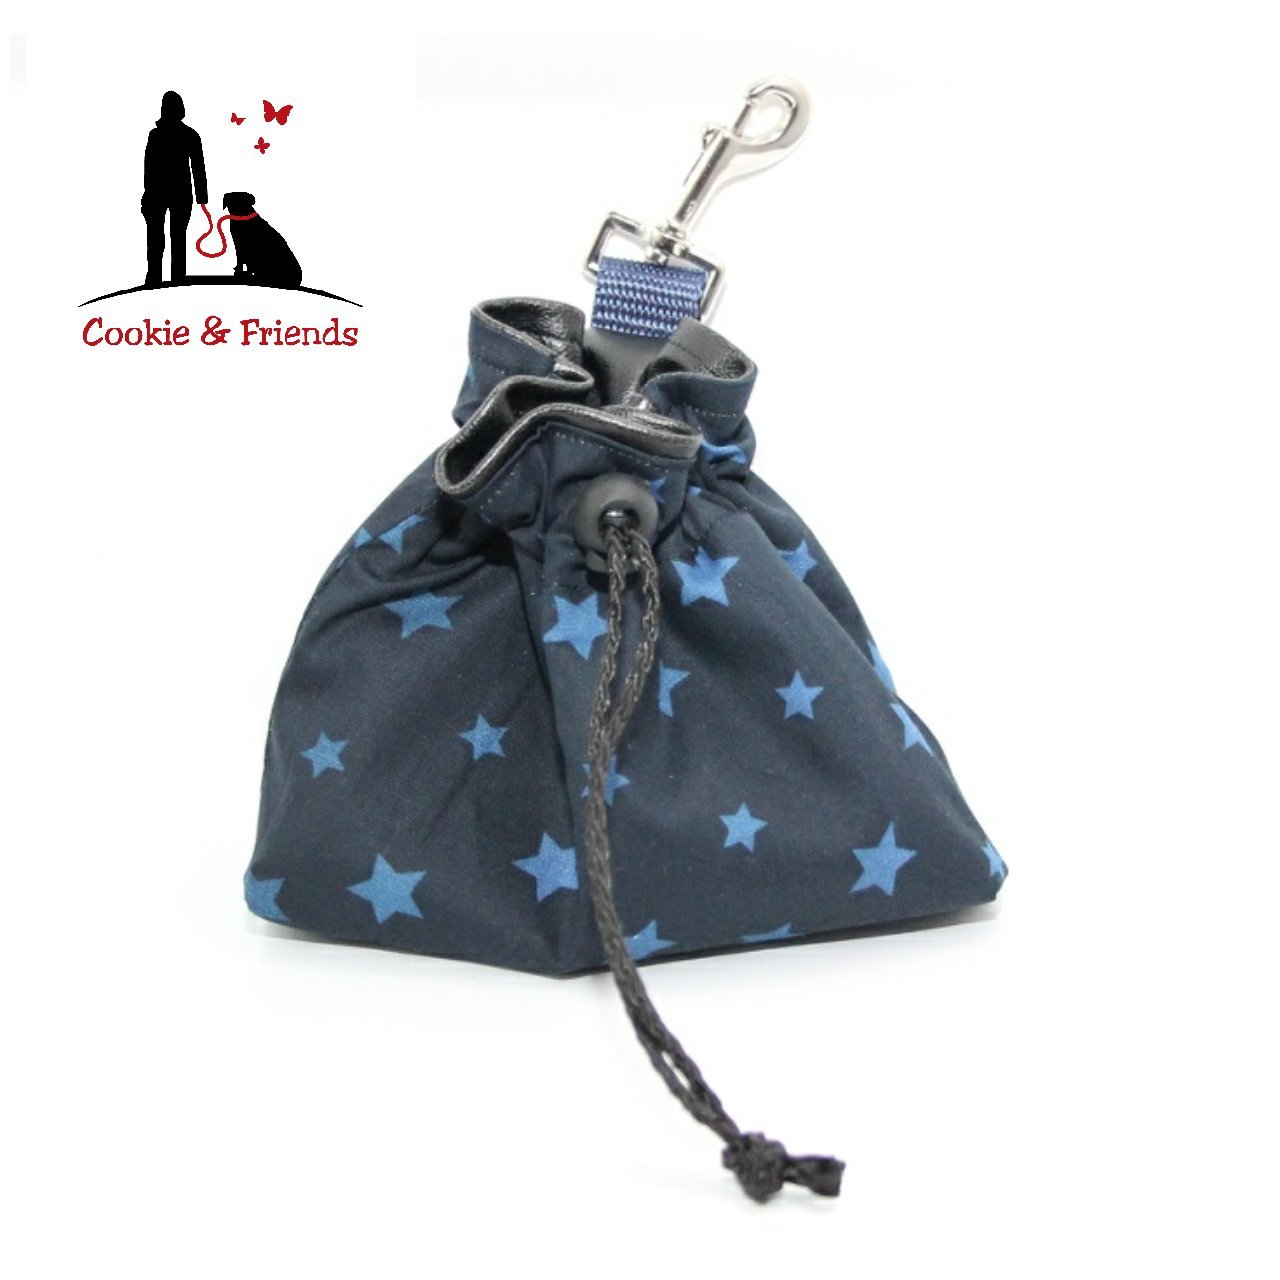 Leckerlibeutel Blue Stars, Leckerlibeutel, Leckerlitasche, Leckerli Beutel, Leckerli Tasche, Hund, Hund Leckerli, Leckerlibeutel Sterne, Sterne